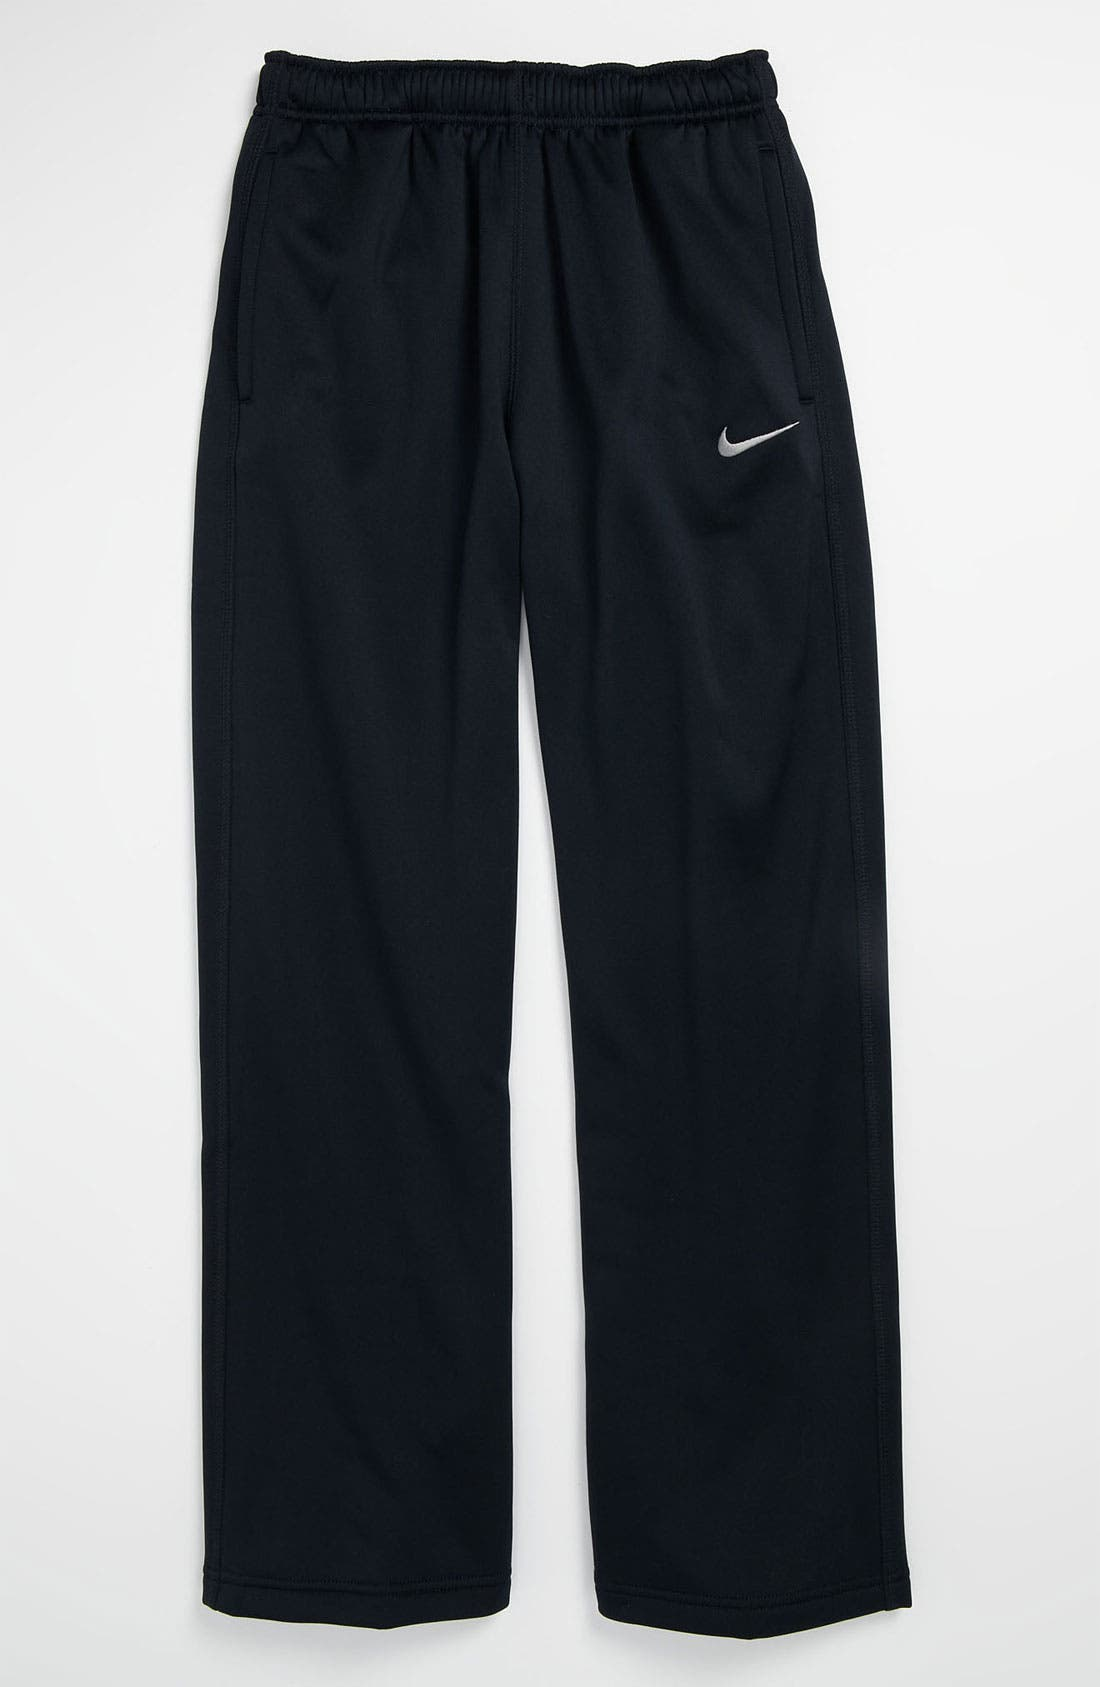 Alternate Image 1 Selected - Nike Athletic Pants (Big Boys)